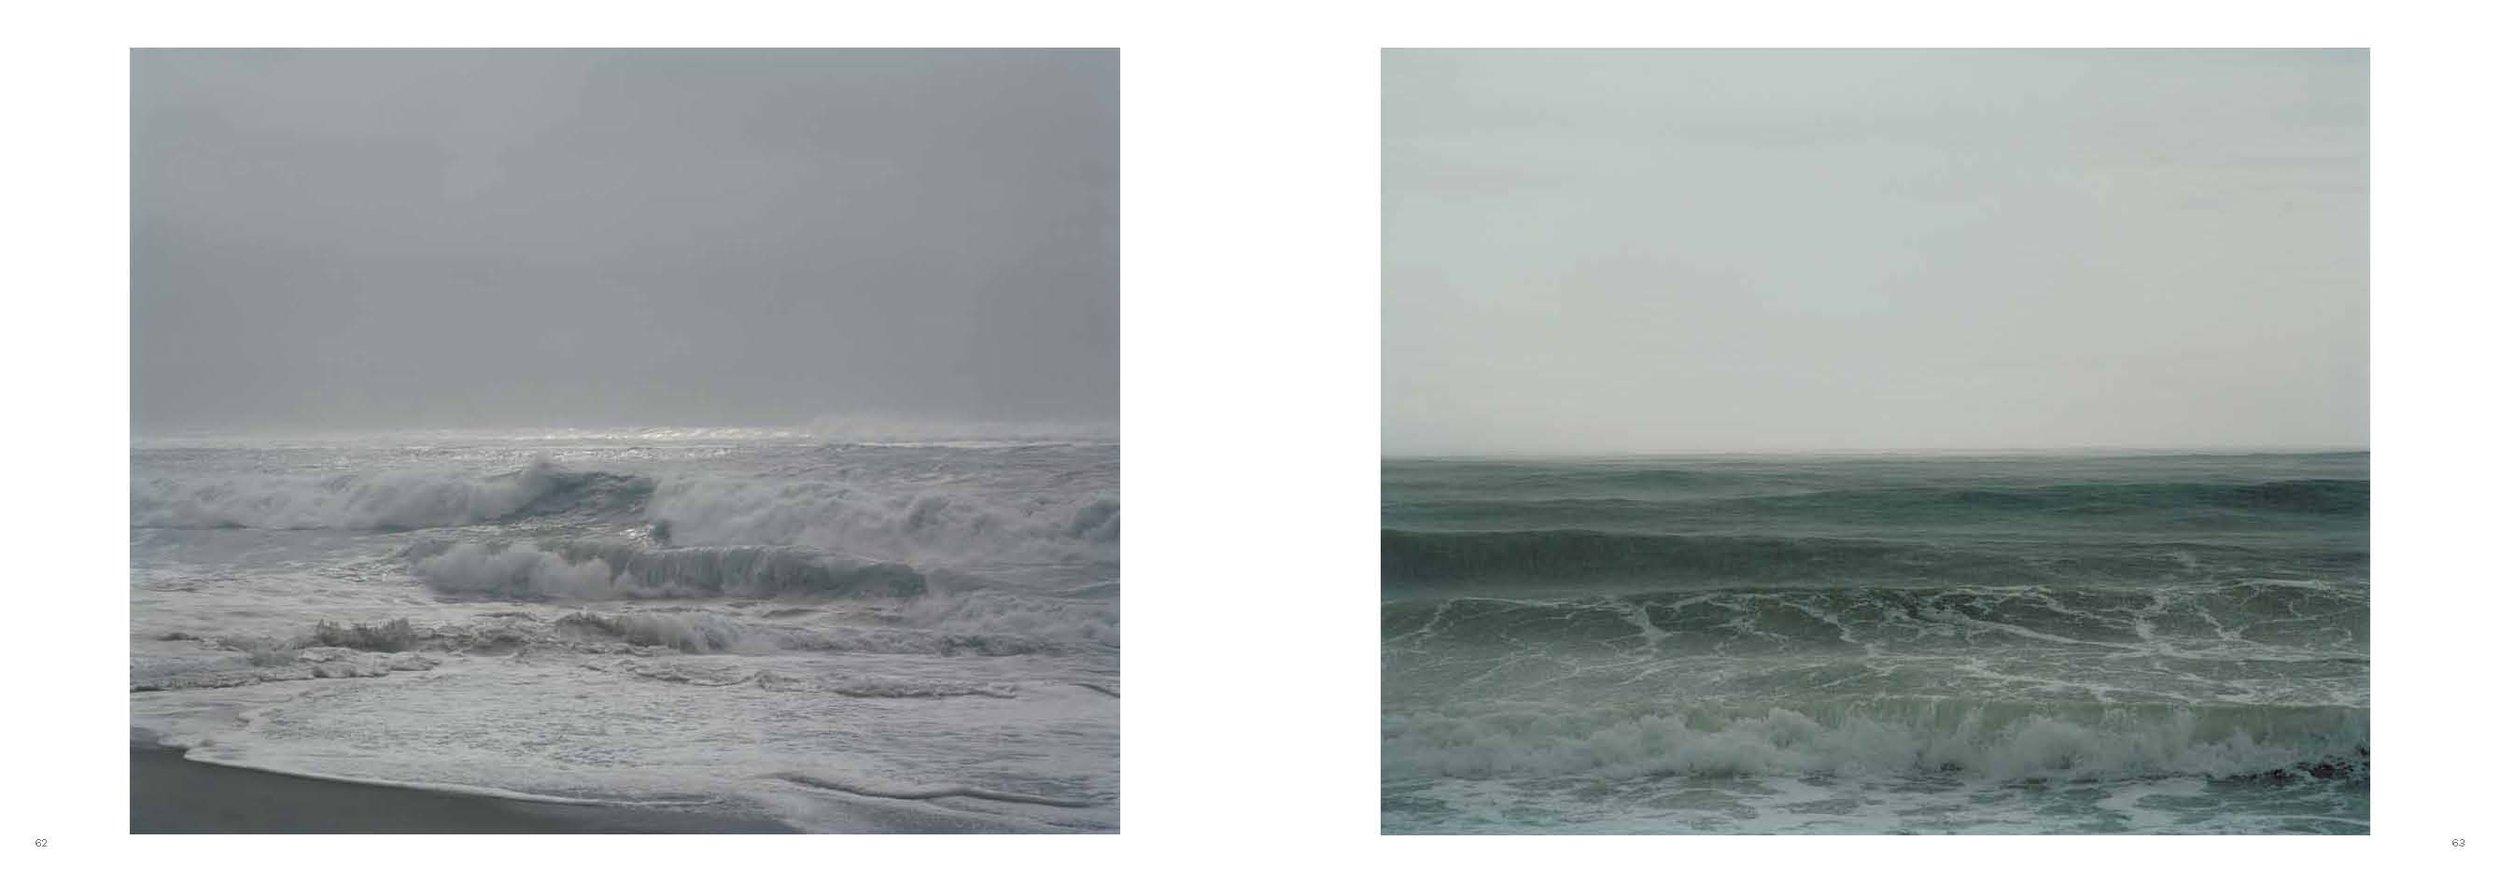 Sand_Sea_Sky_32.jpg